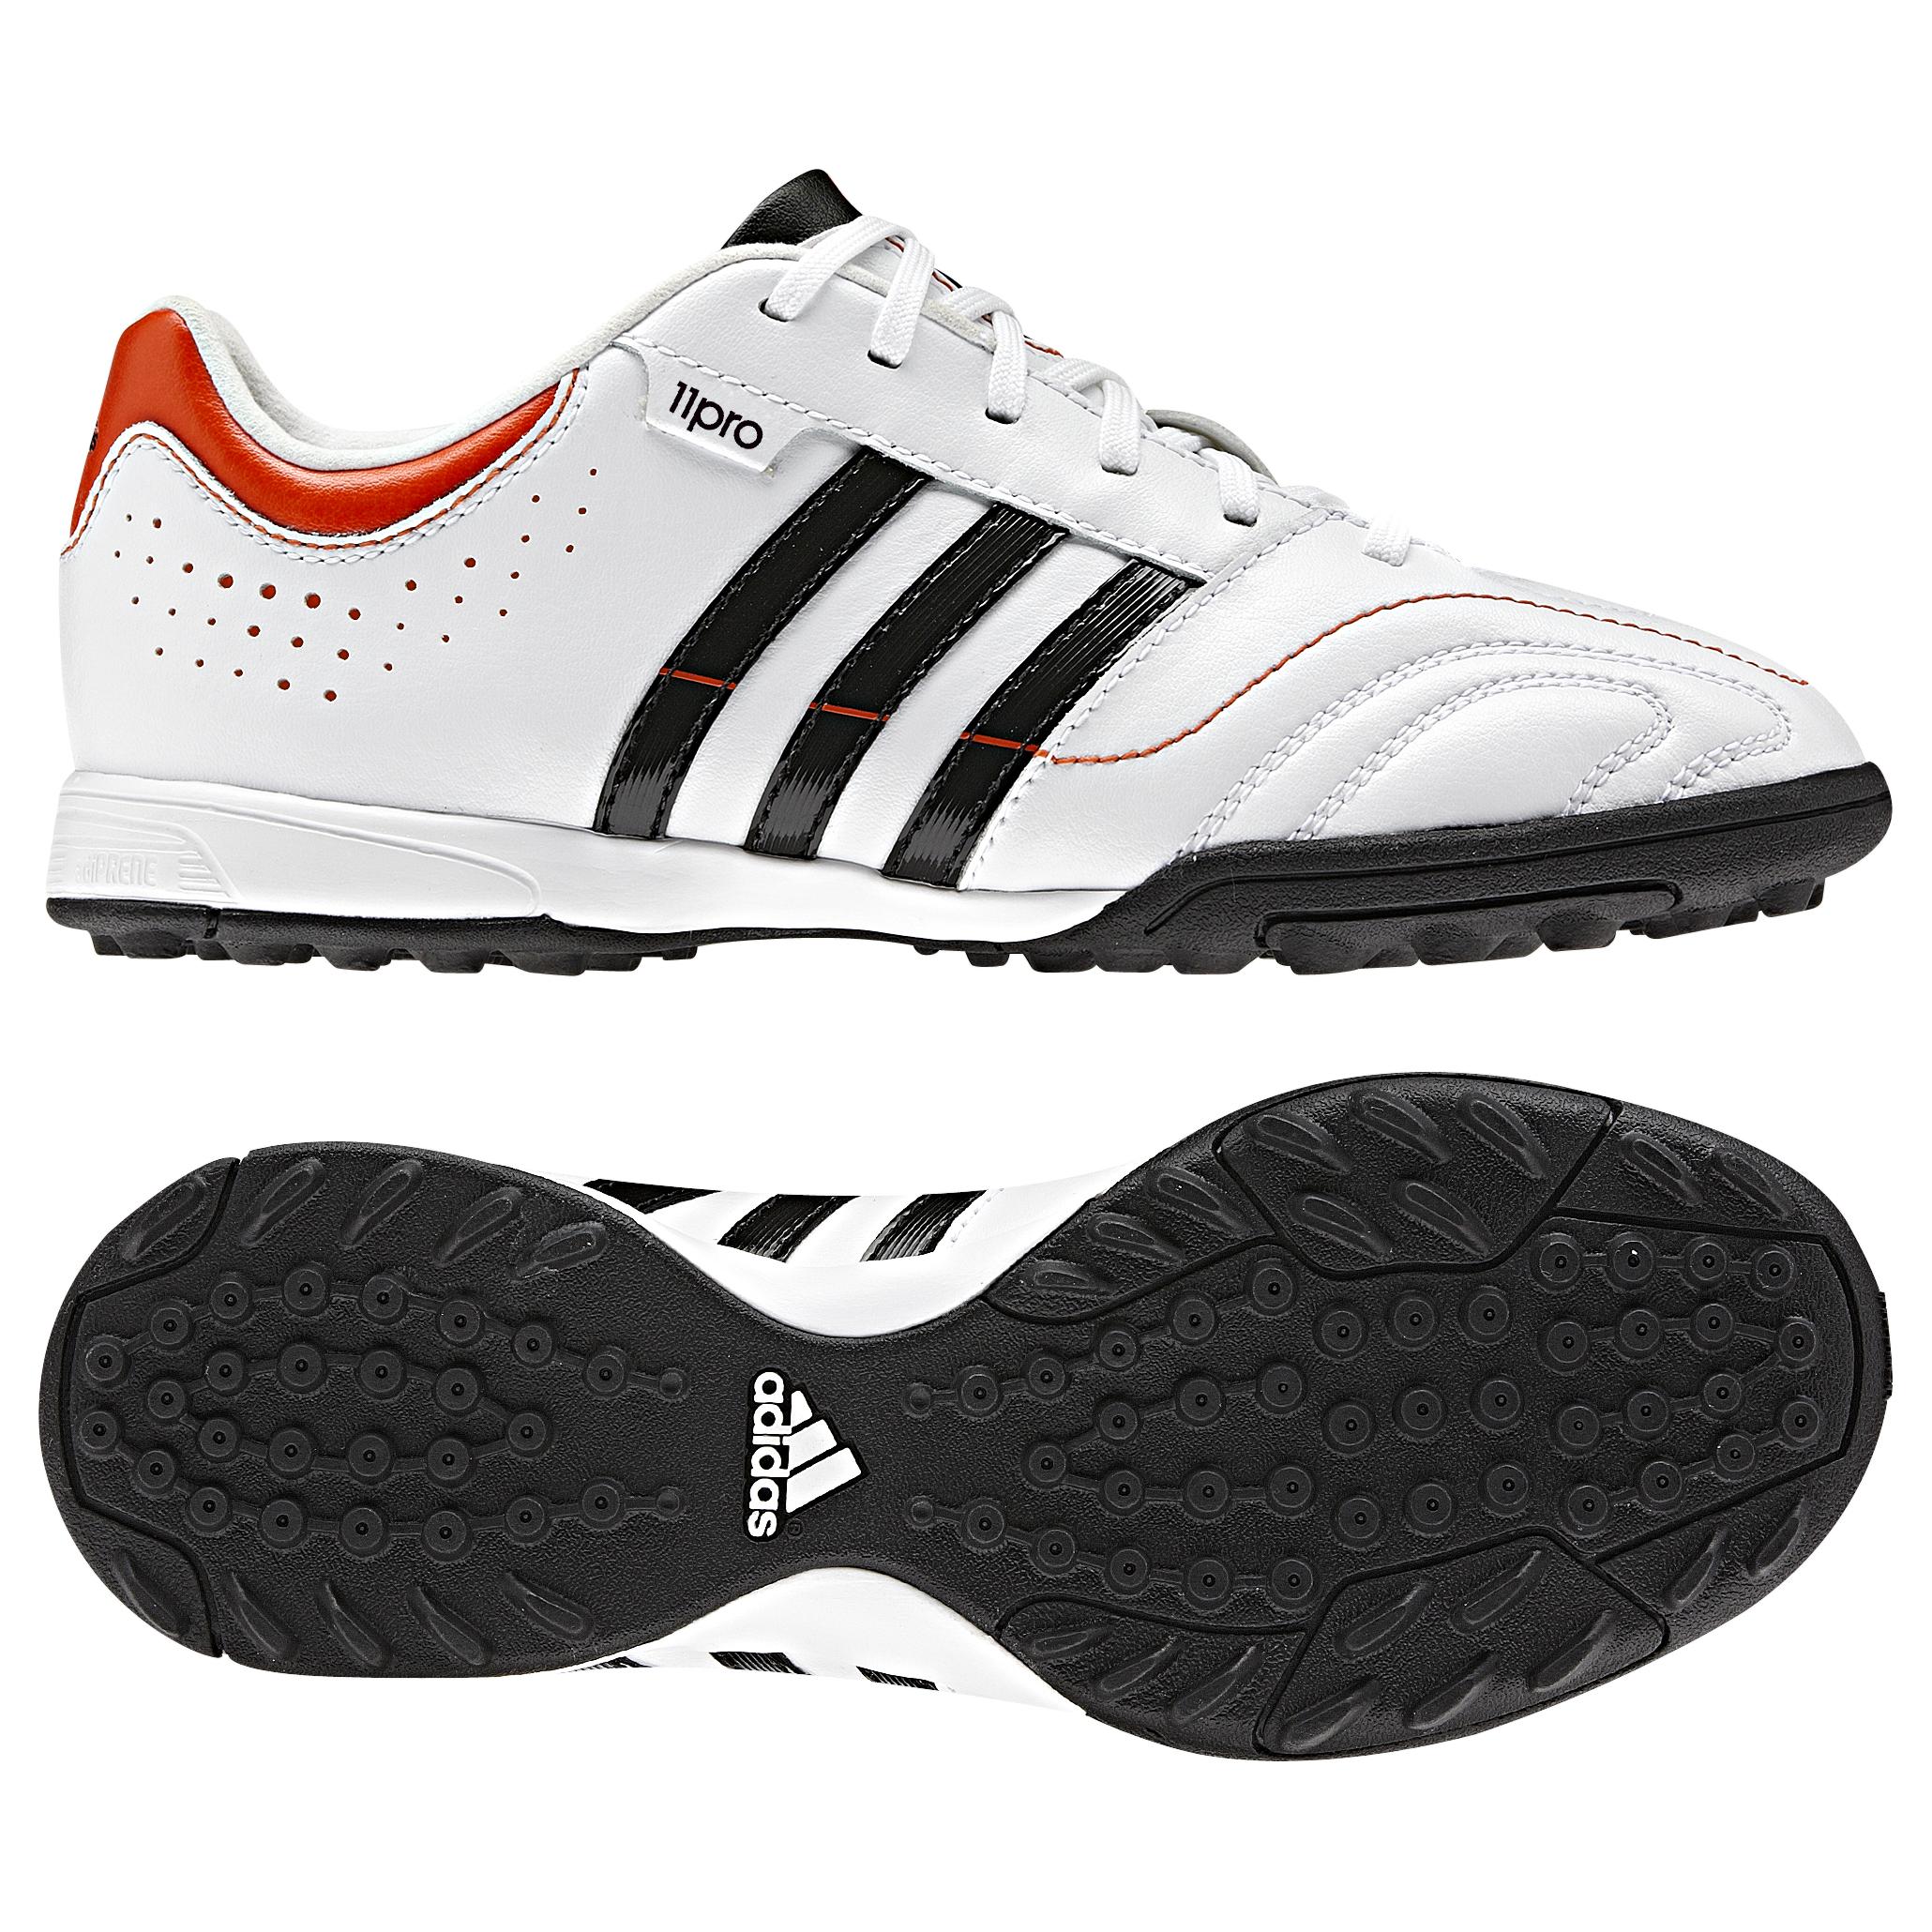 on sale 71151 3d5bb adidas 11Nova TRX Astro Turf Trainers - Kids - Running White Black 1 High